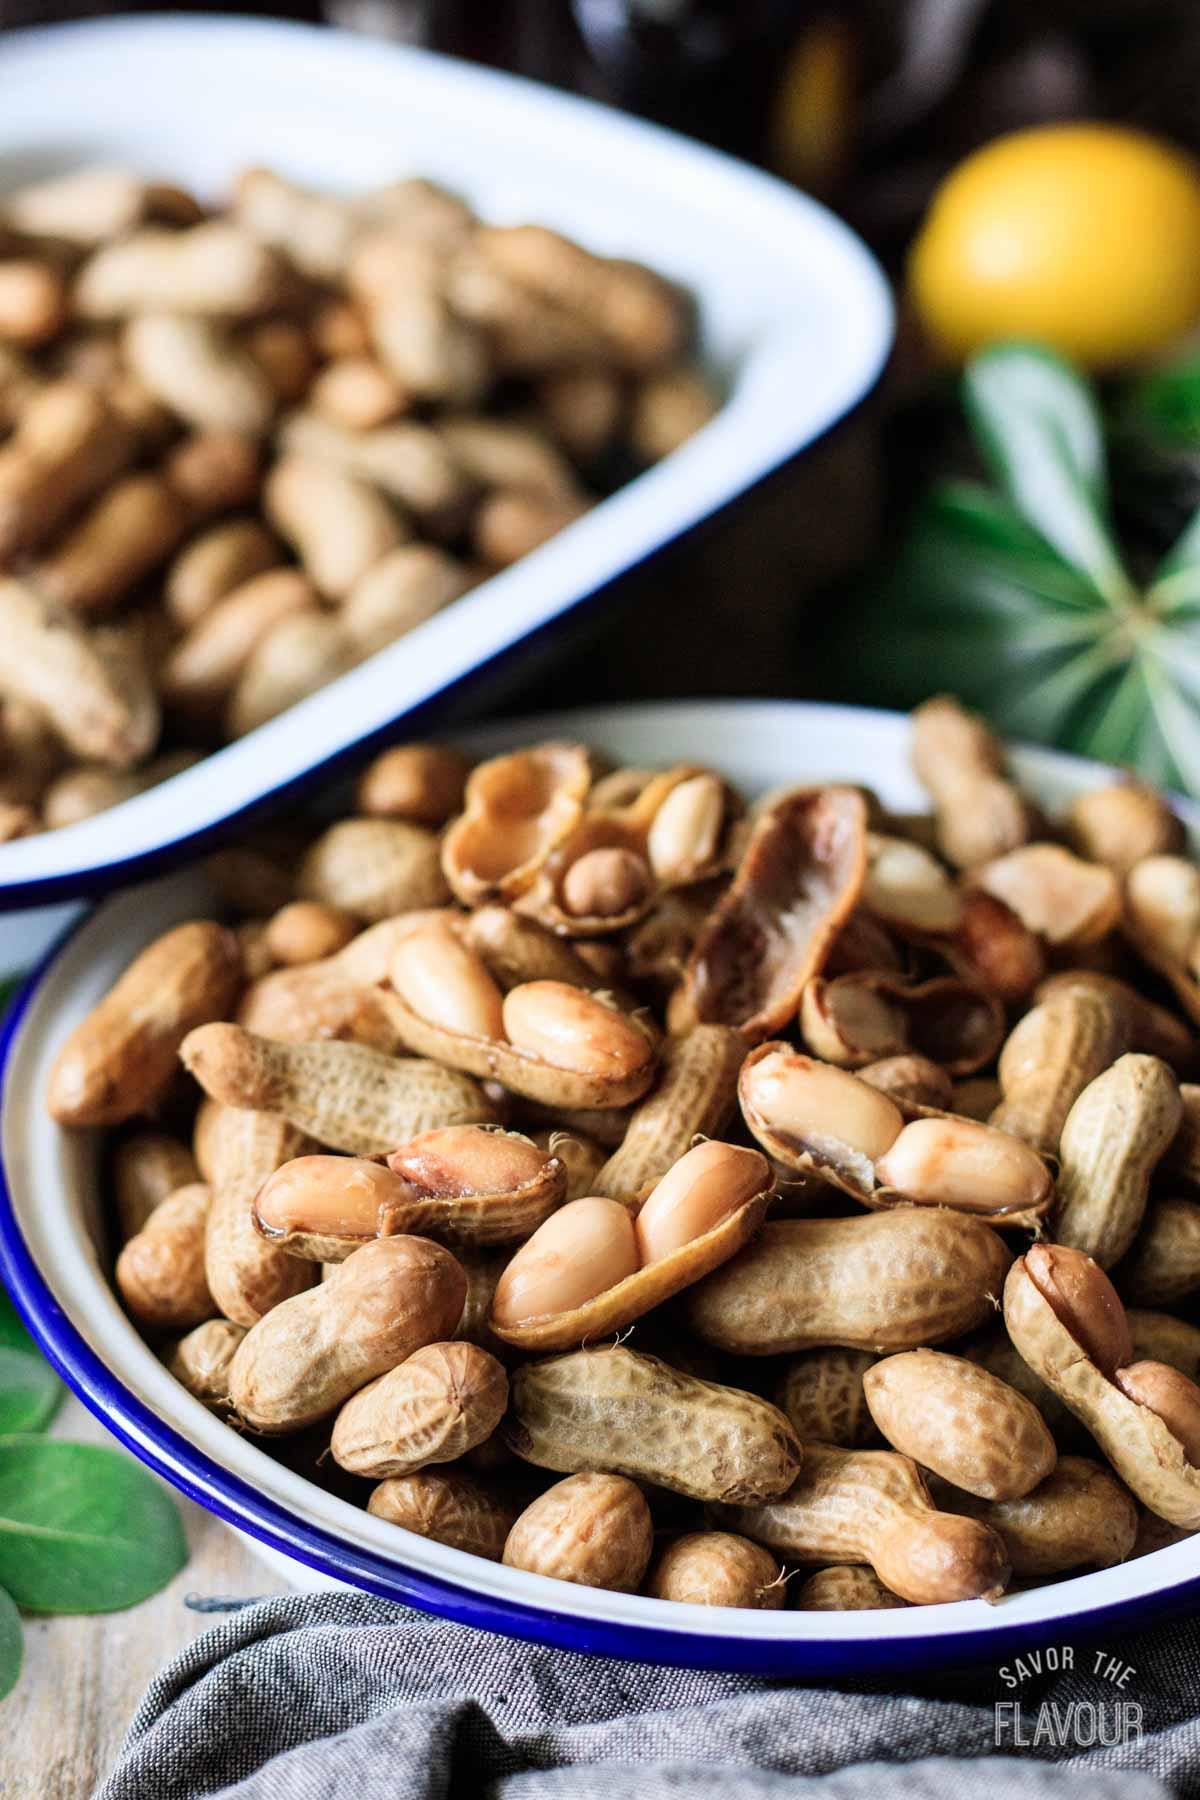 dish of boiled peanuts